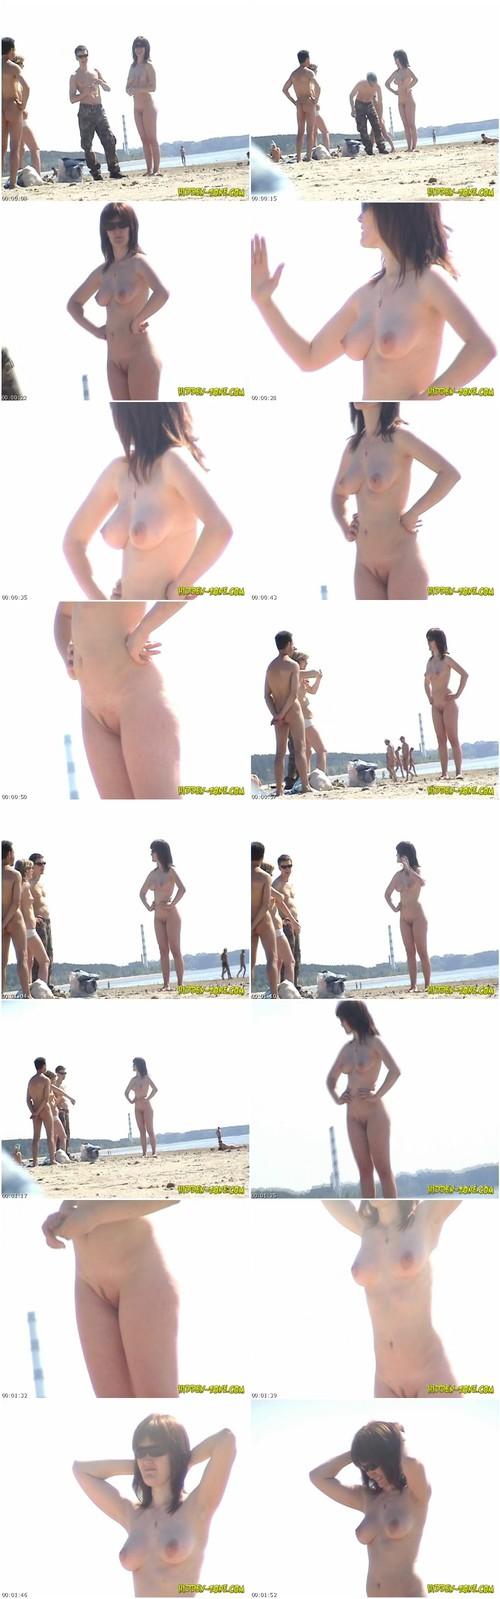 Nudity018_thumb_m.jpg